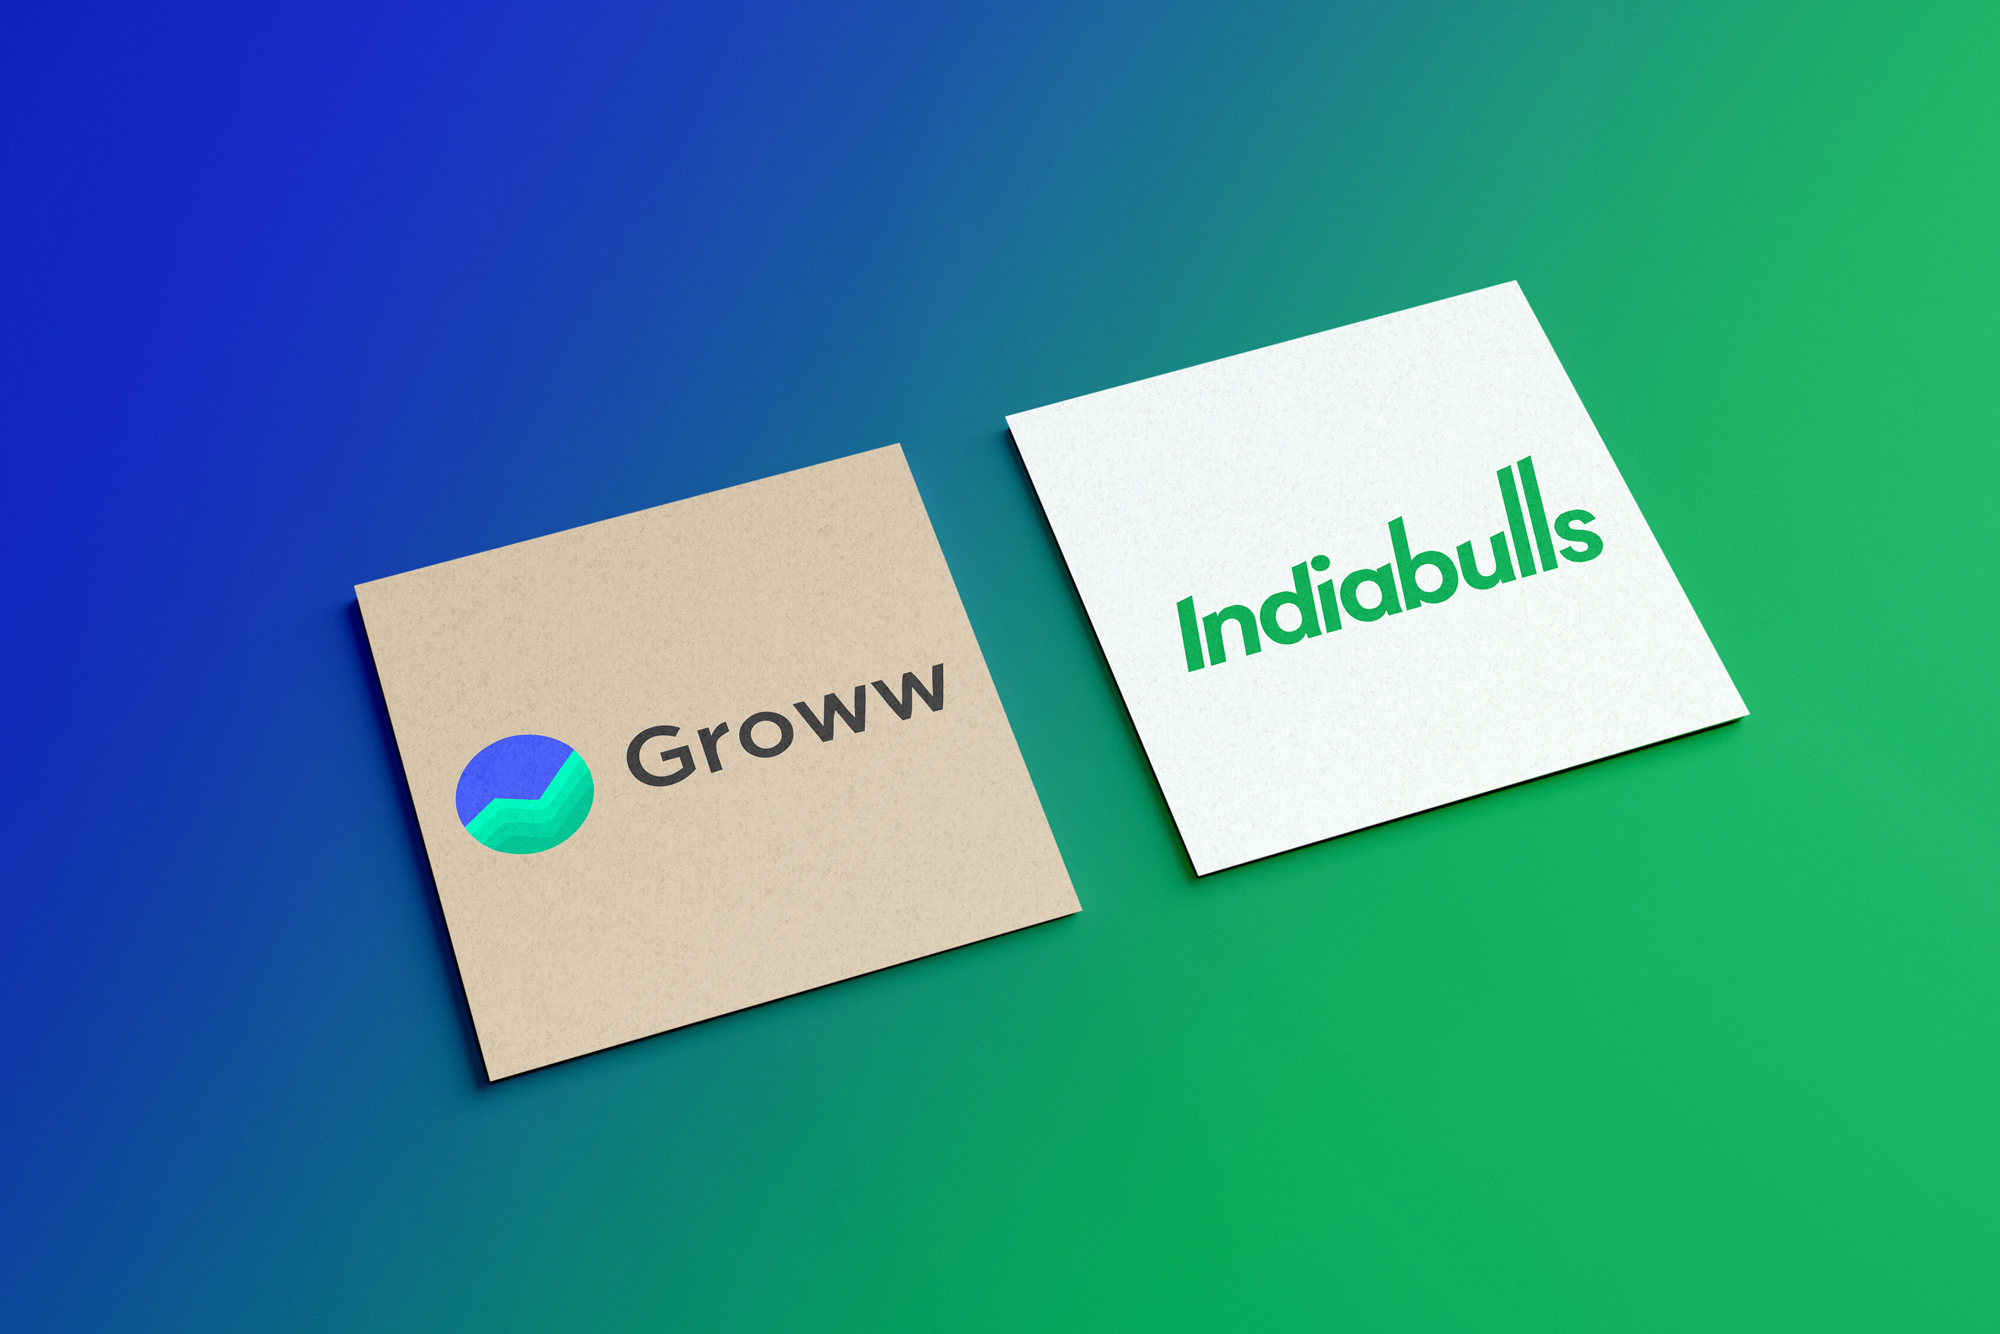 Groww and Indiabulls logo on square card